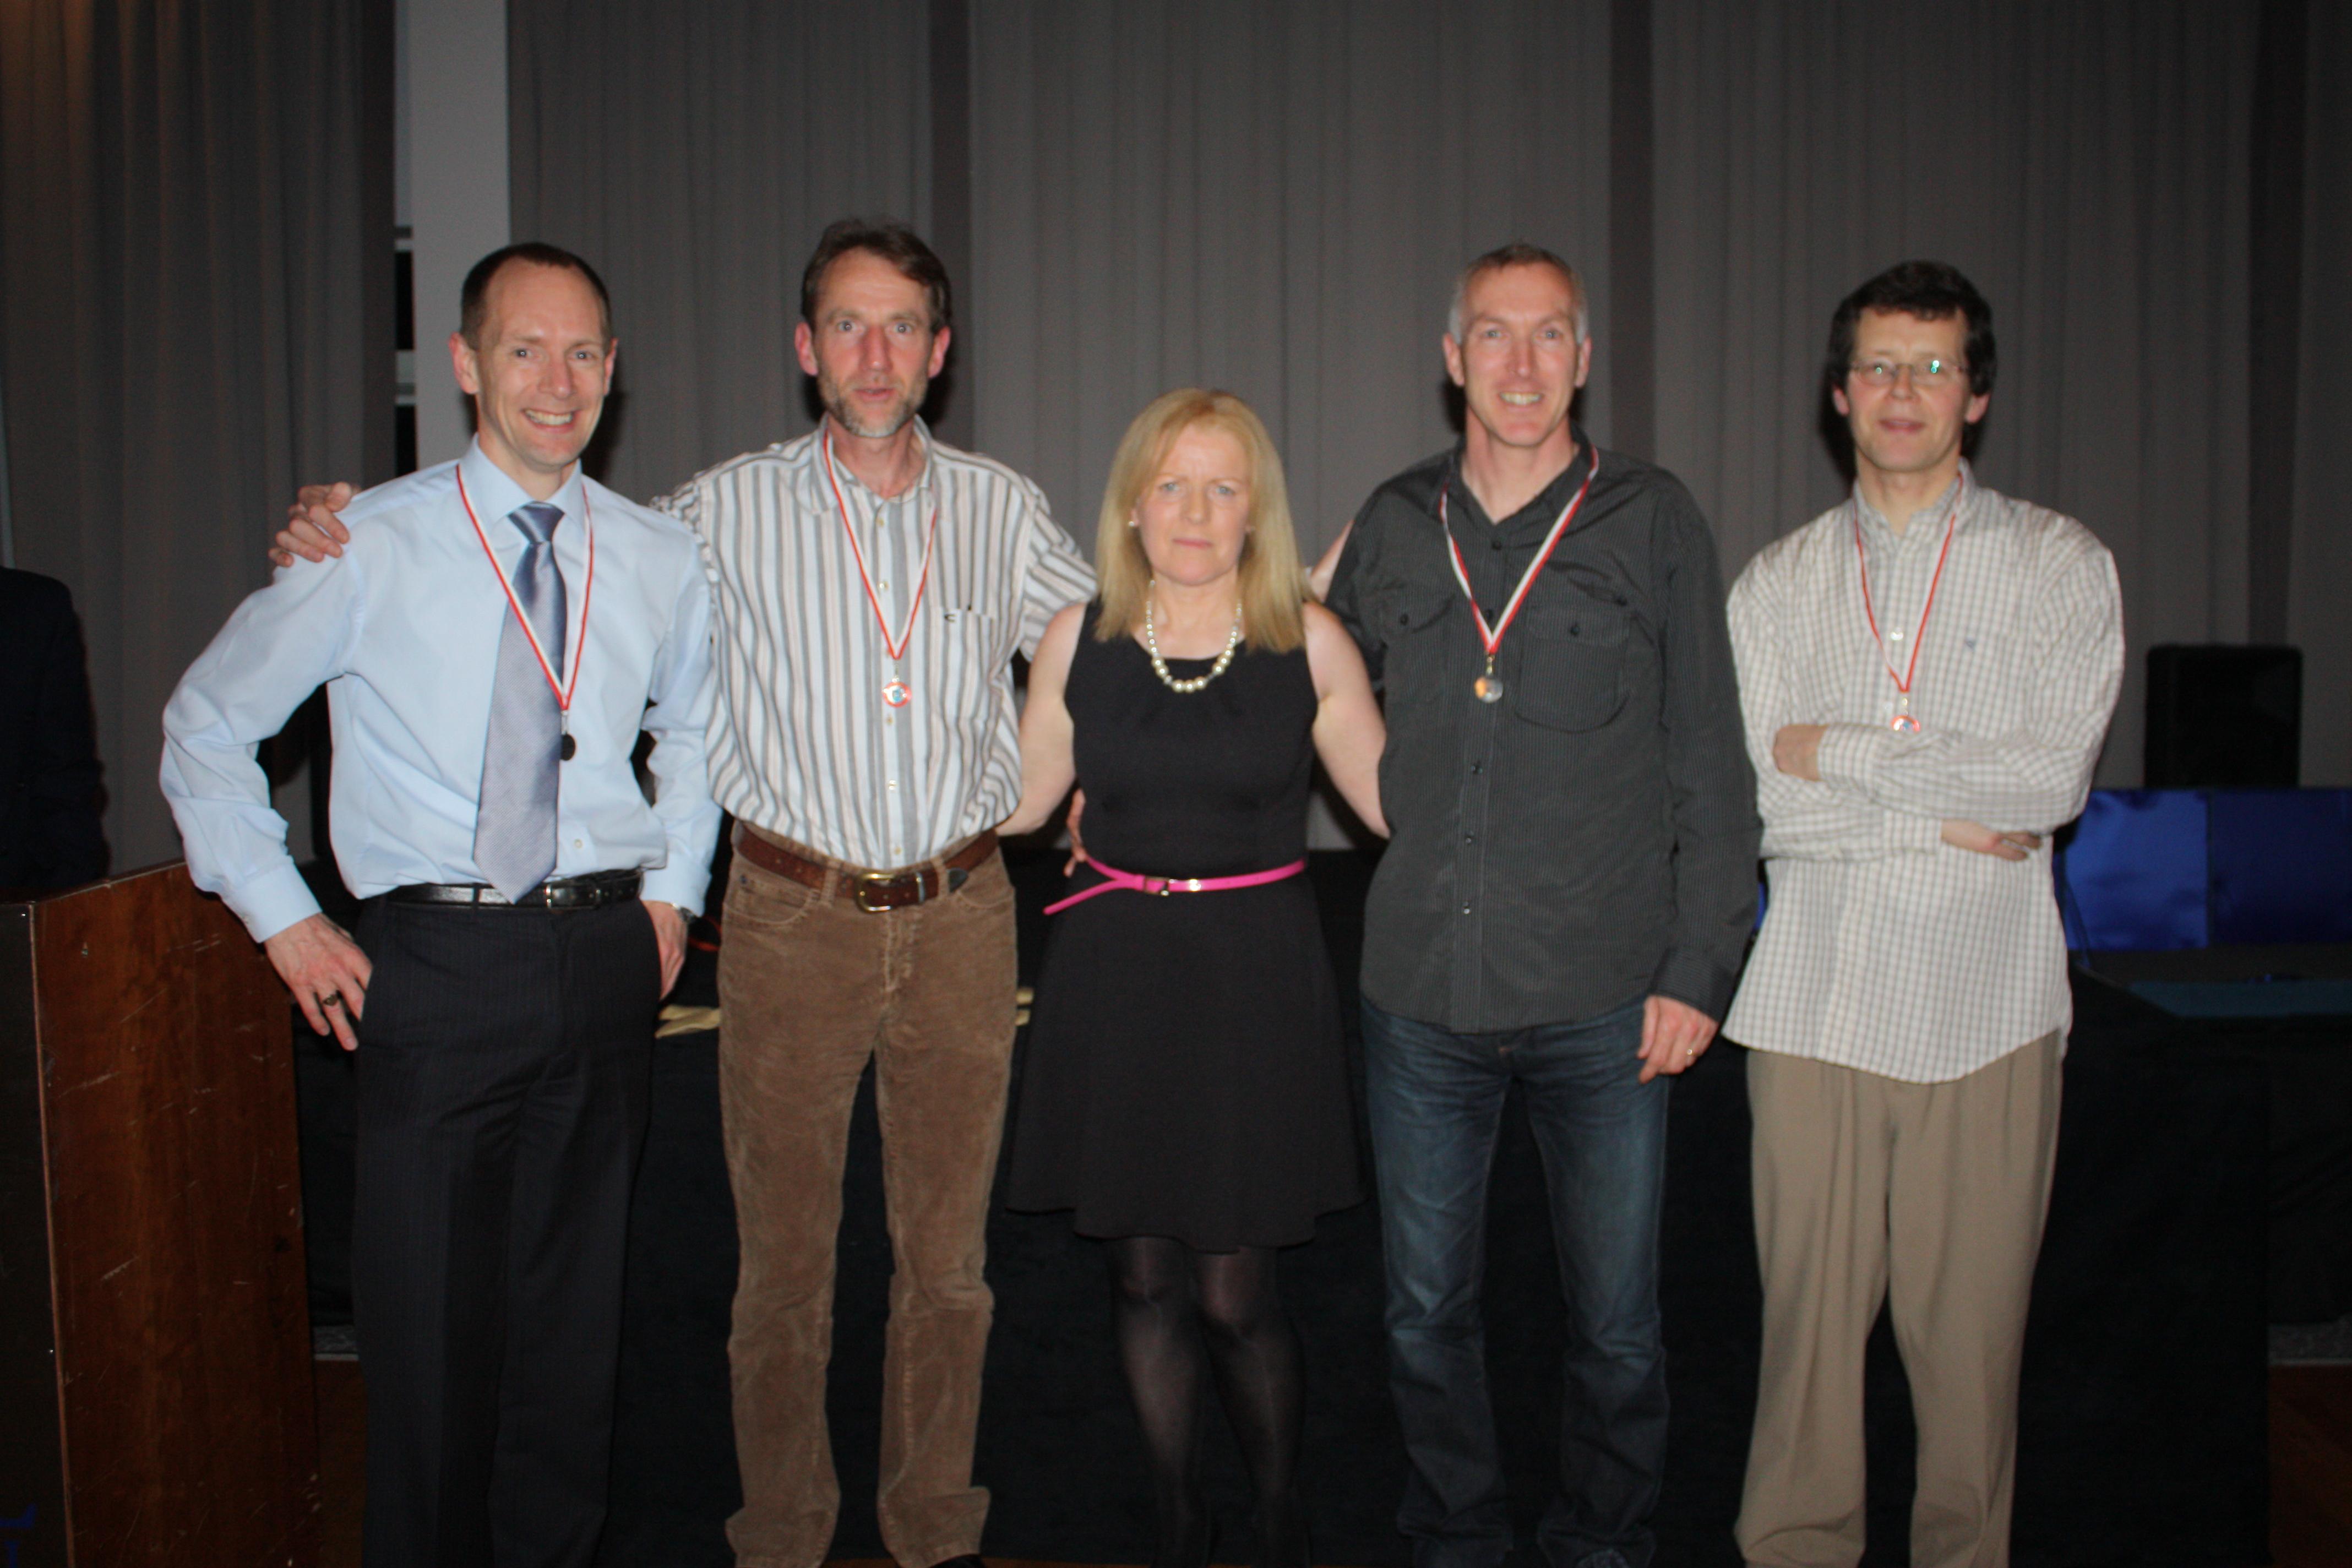 st-finbarrs-awards-night-2012-006